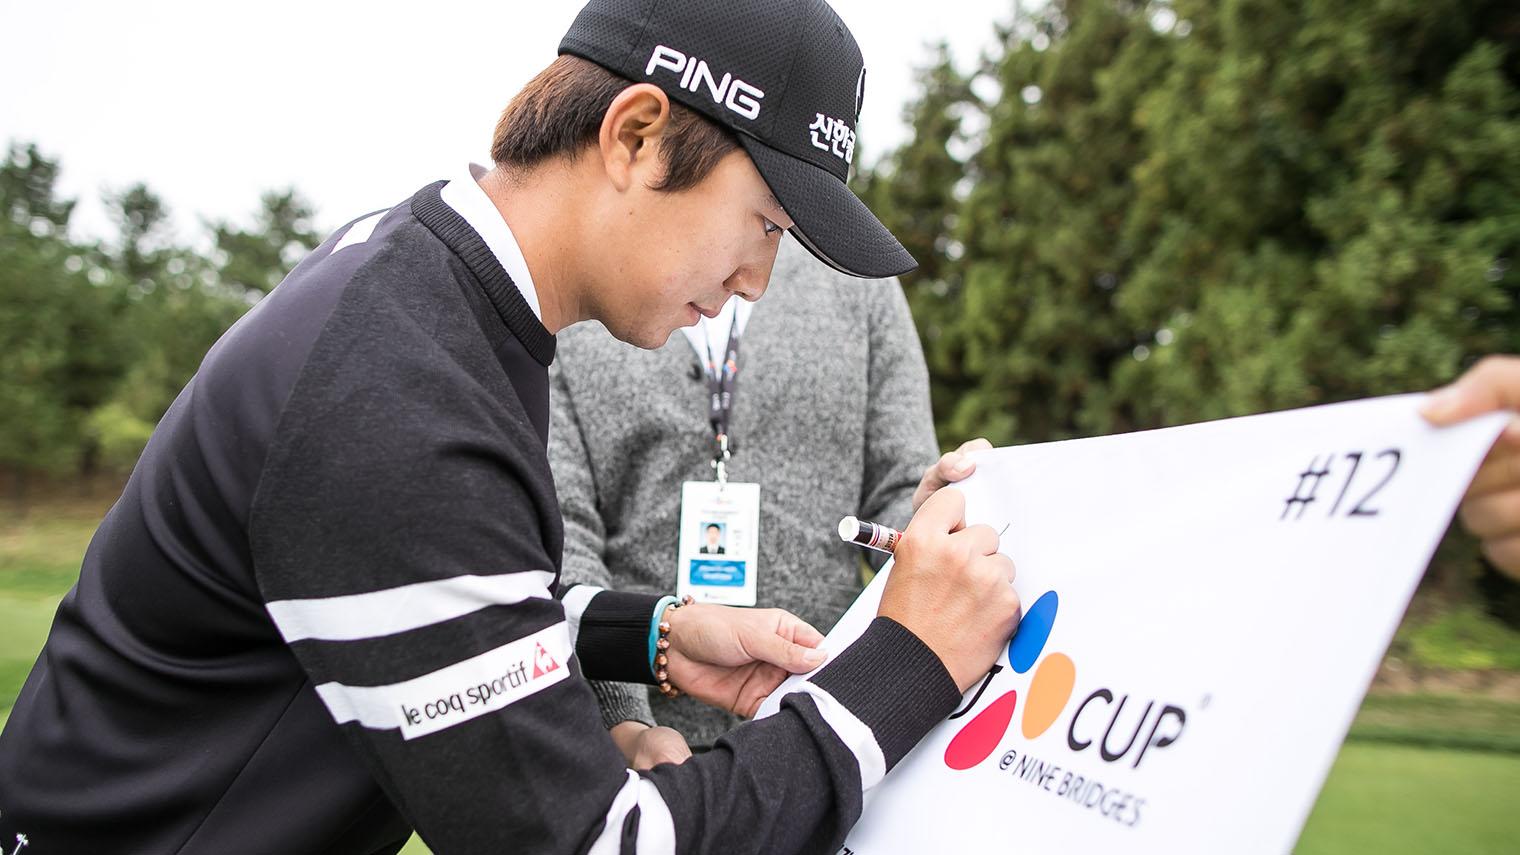 THE CJ CUP @ NINE BRIDGES 에 정성껏 사인을 하는 송영한 선수